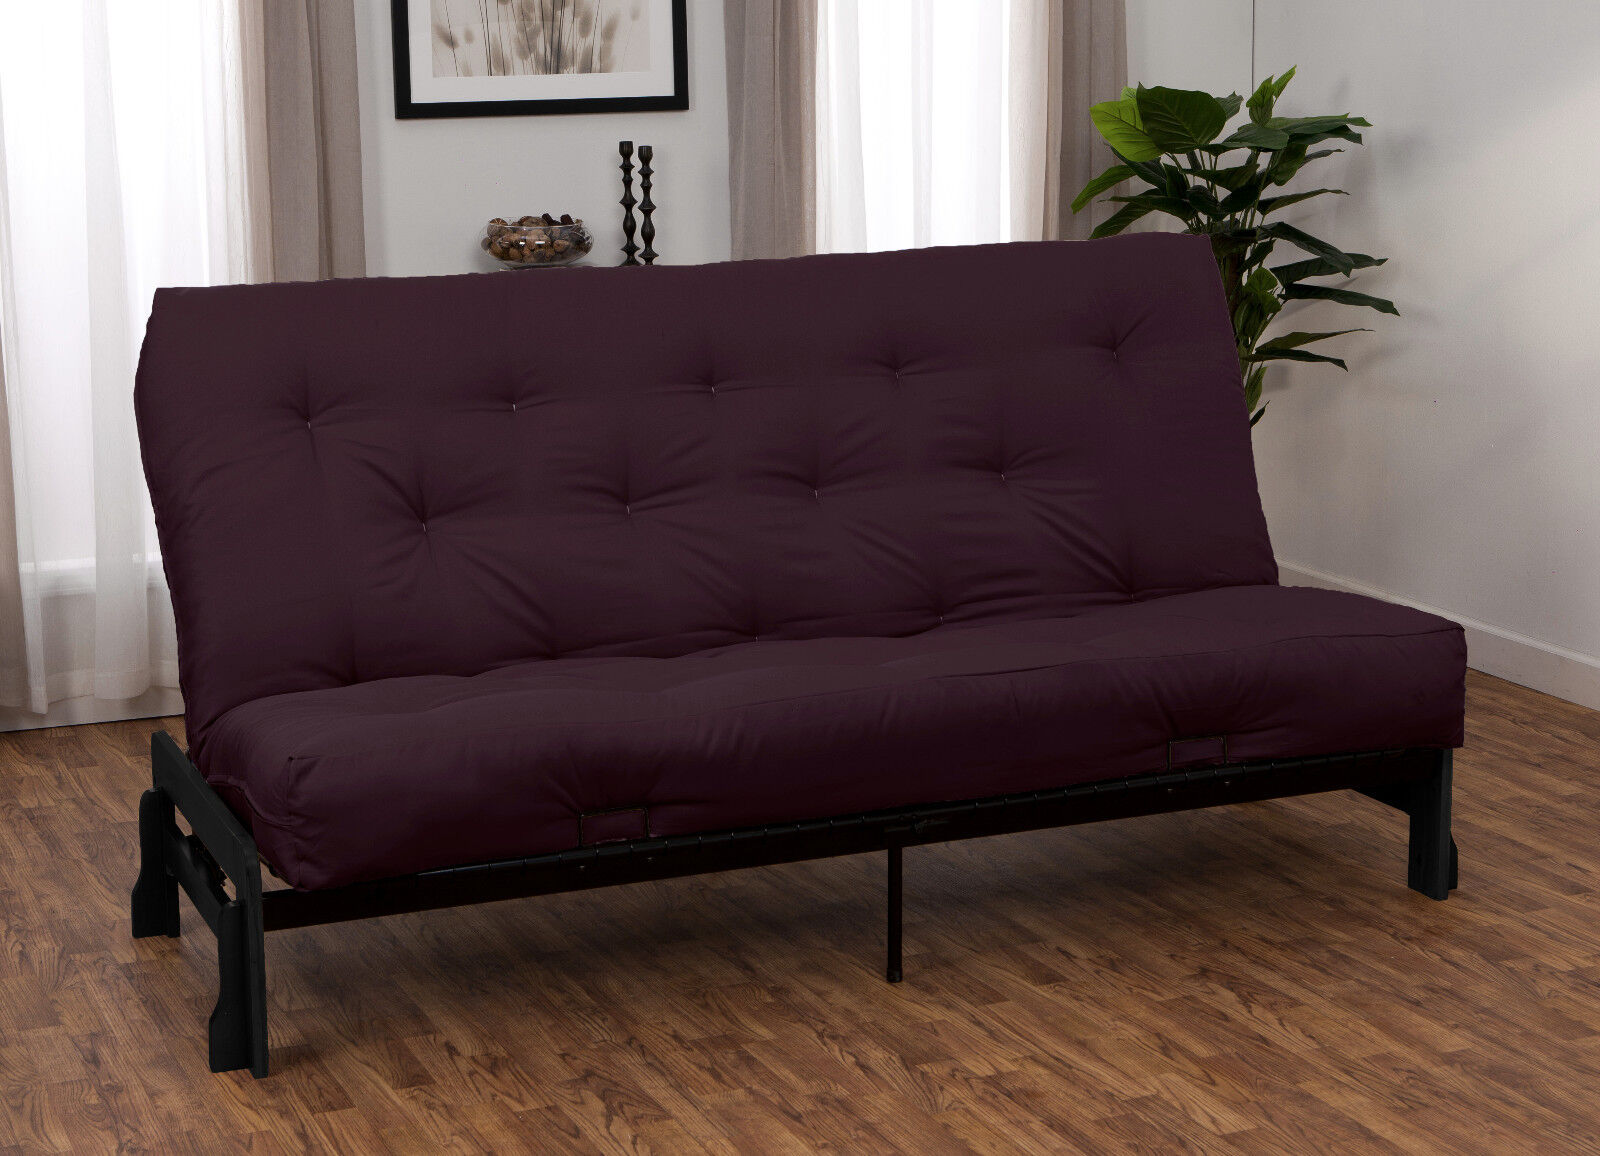 bali wood metal futon frame and futon